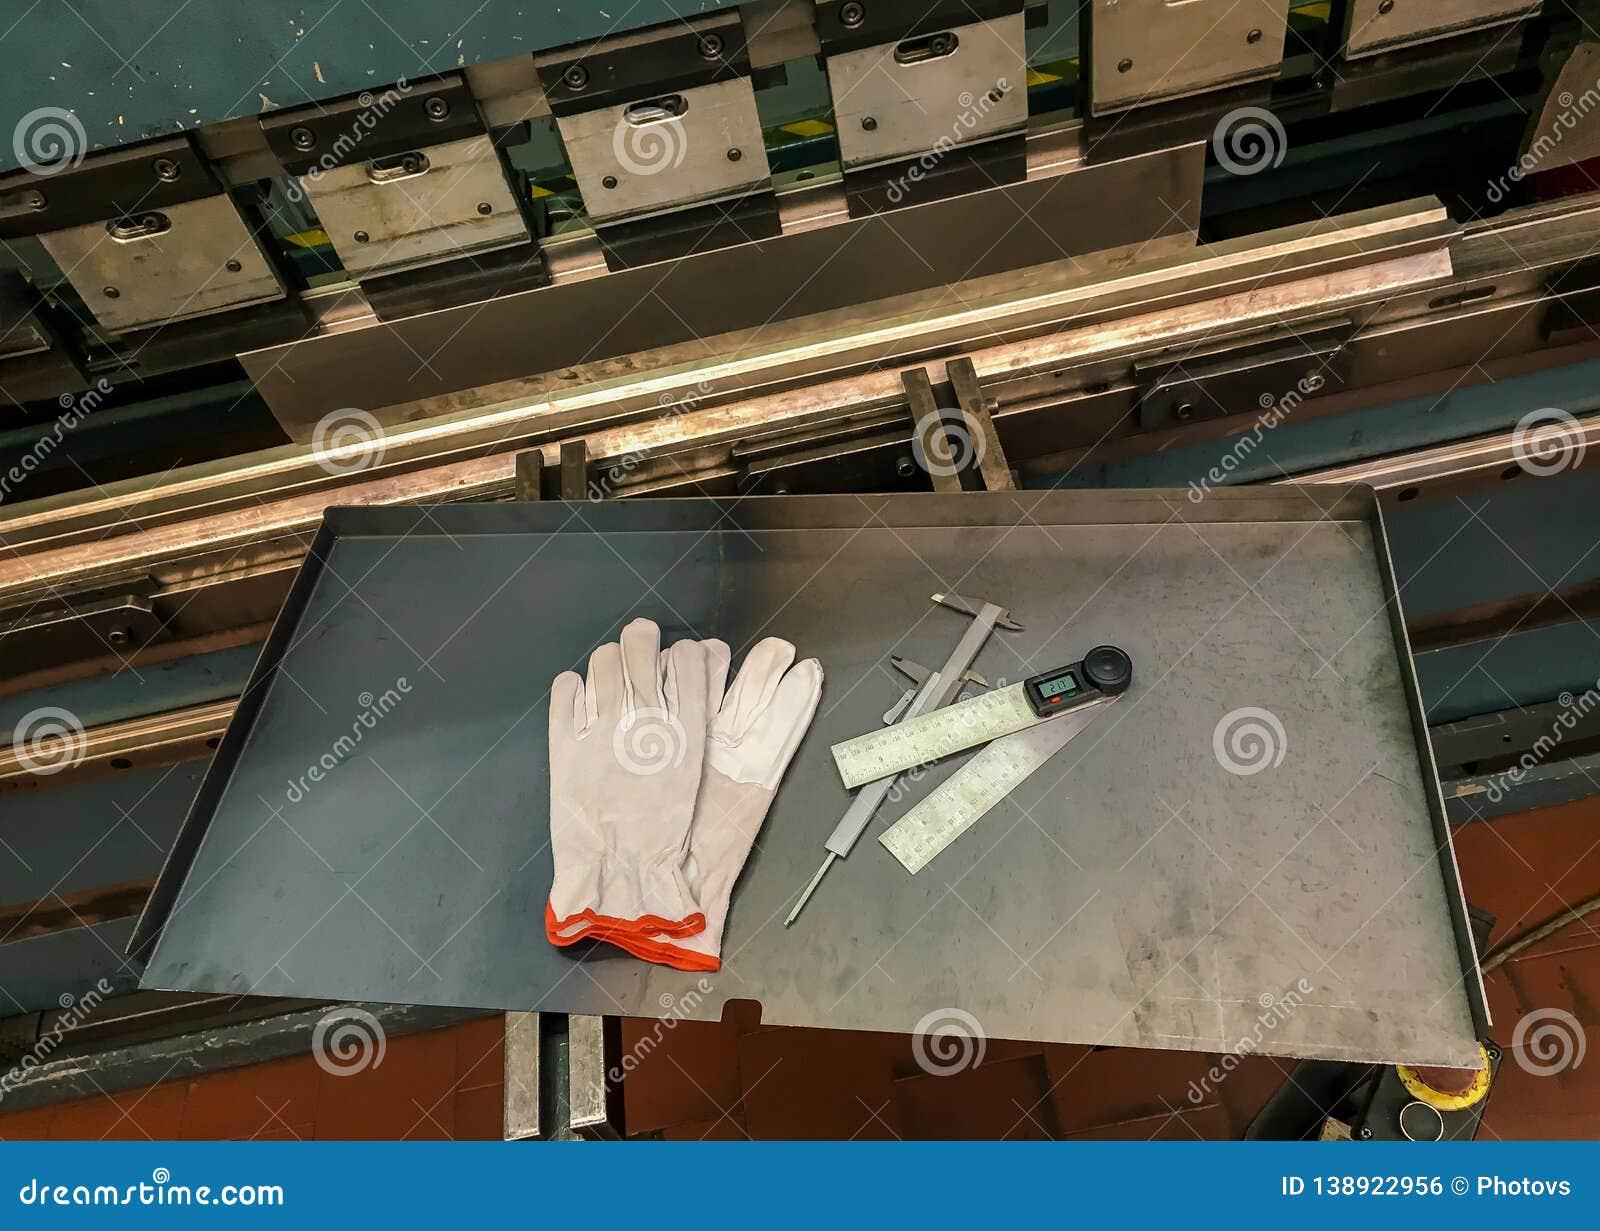 Sheet Metal Bending In Factory Stock Photo - Image of fabrication